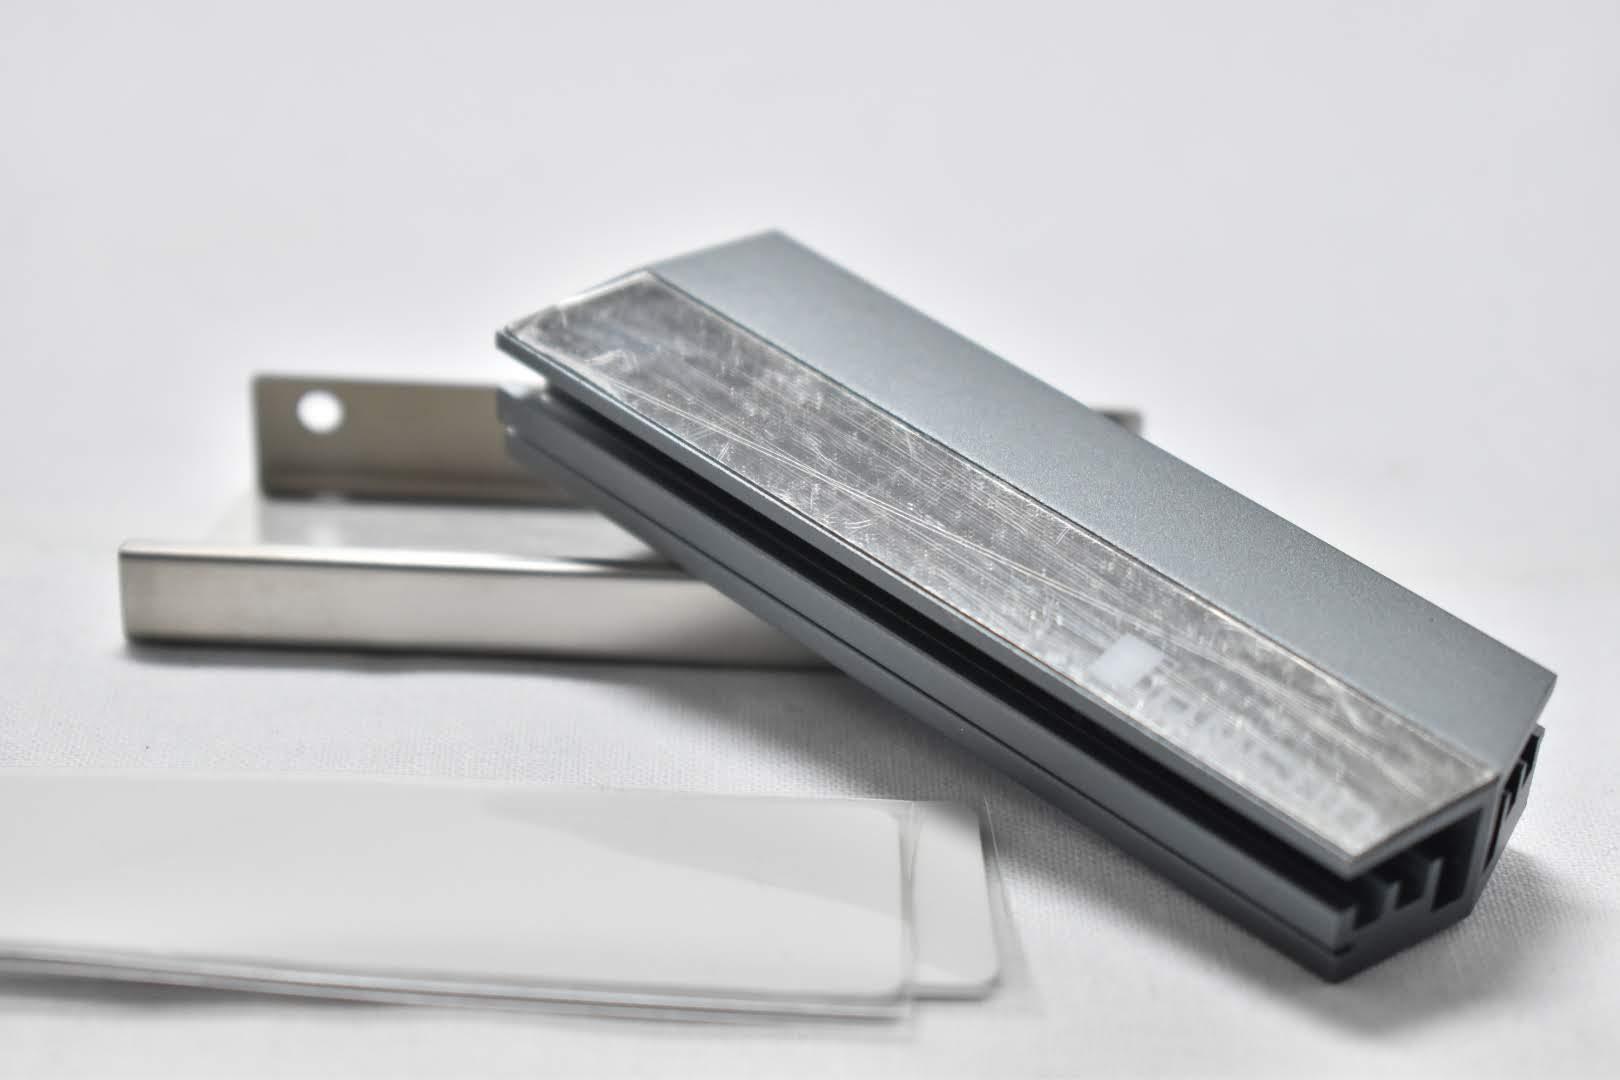 DSC_3188 爆熱のM.2 SSDの熱対策! JONSBO M2-GRAYが良く冷える!